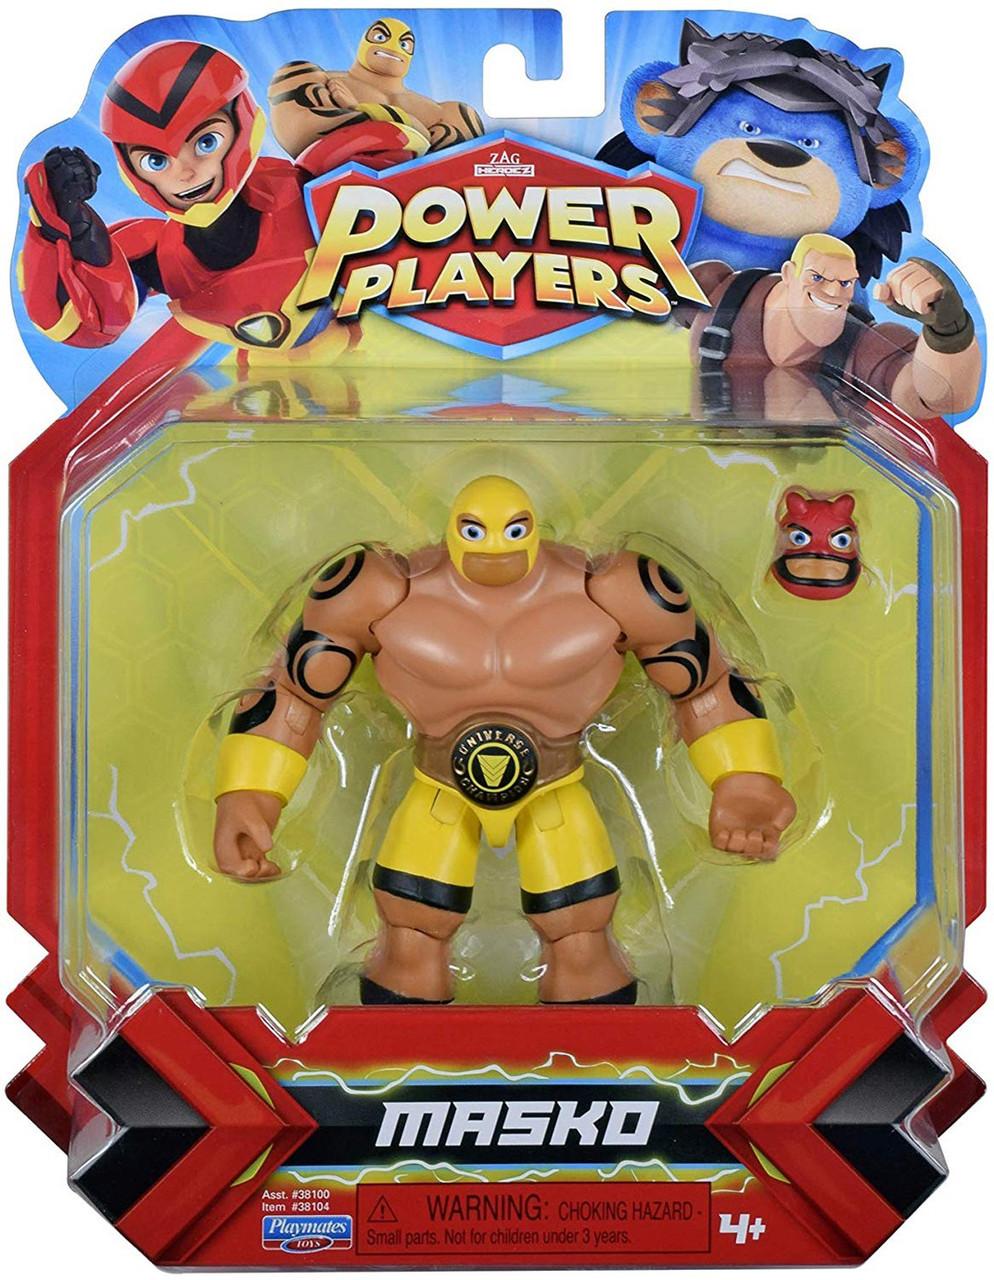 Zag Heroez Power Players Super Stretch Masko Action Figure